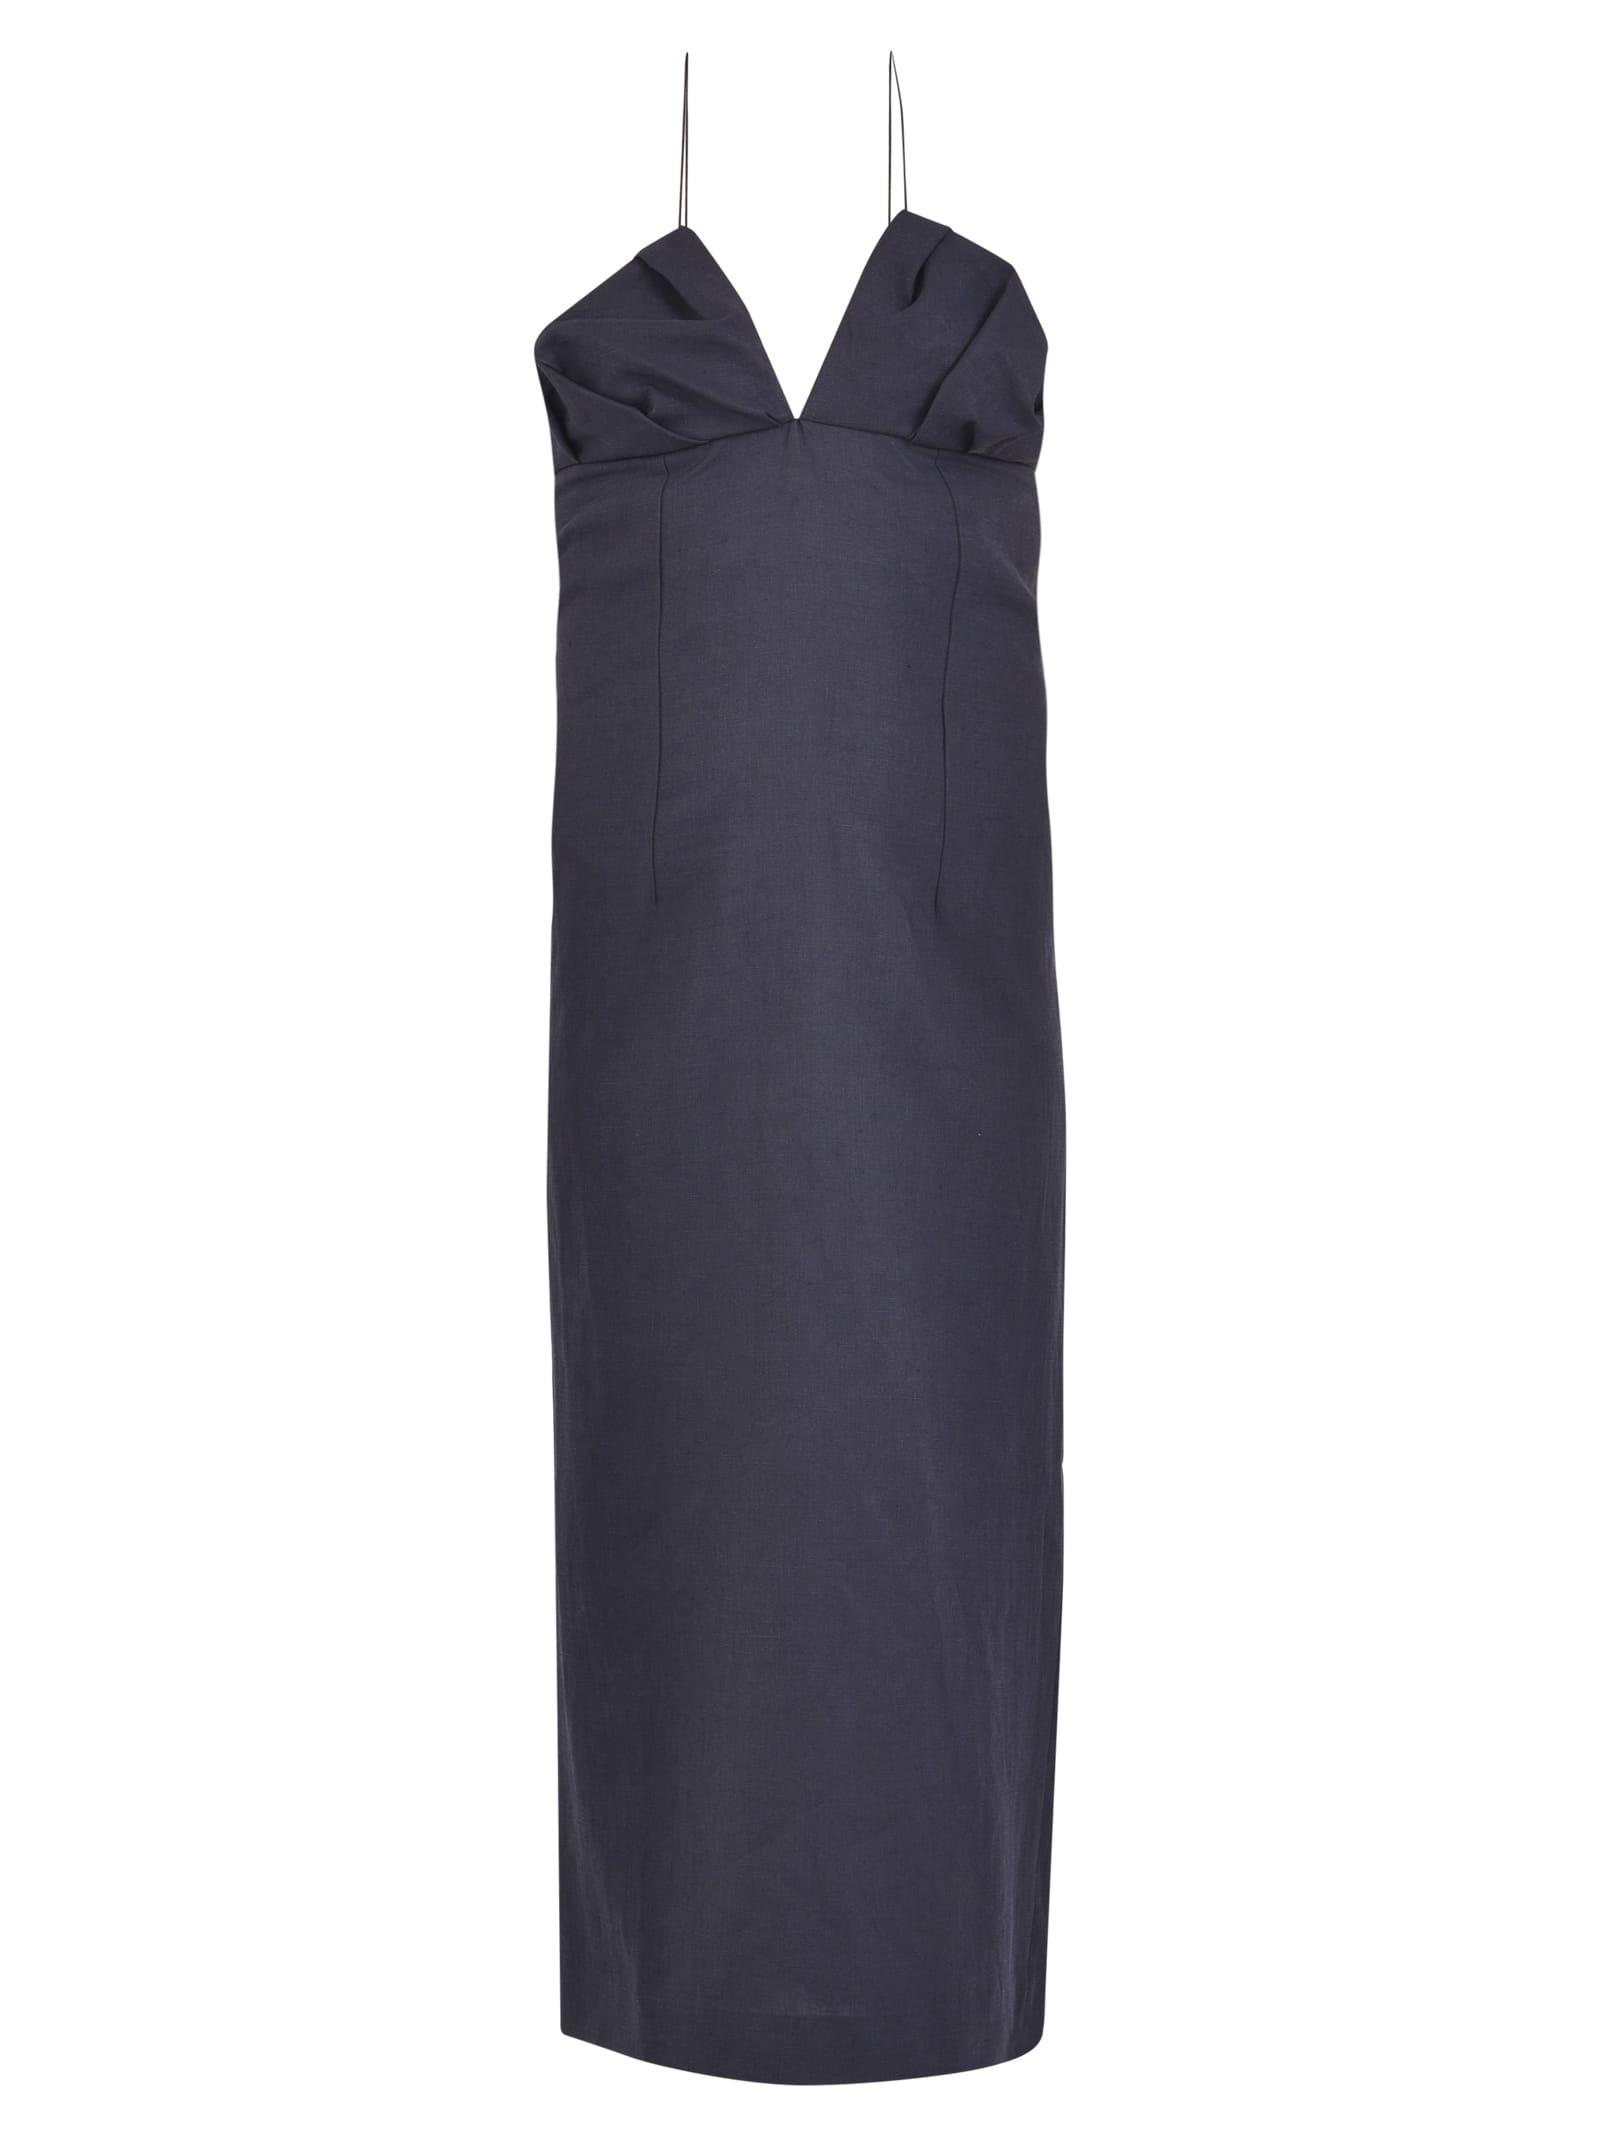 Jacquemus Halterneck Dress